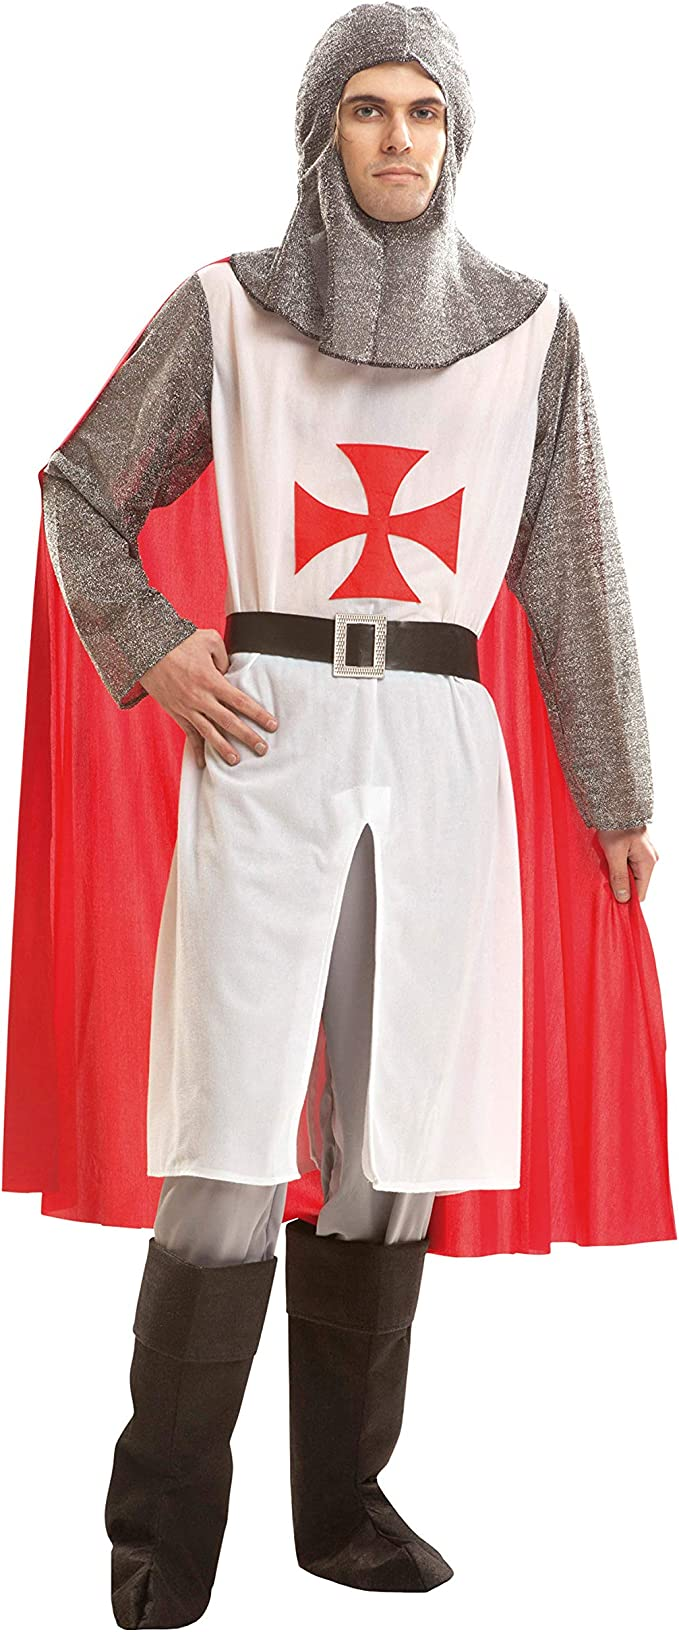 My Other Me Me - Disfraz de Caballero medieval, talla M-L (Viving ...